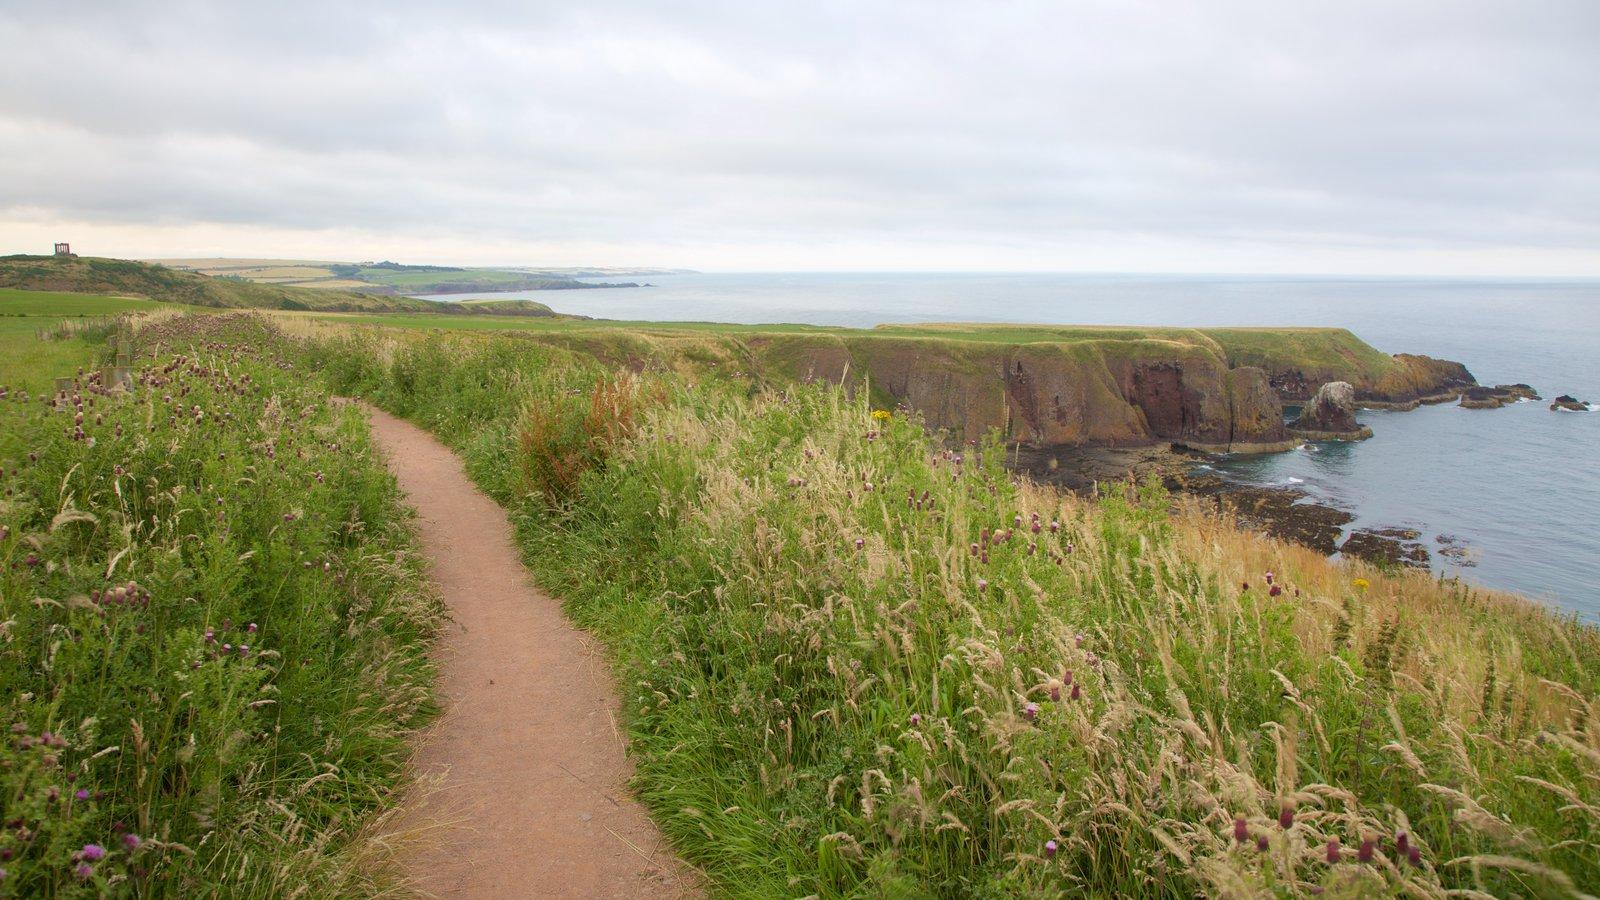 Dunnottar Castle featuring hiking or walking, general coastal views and farmland